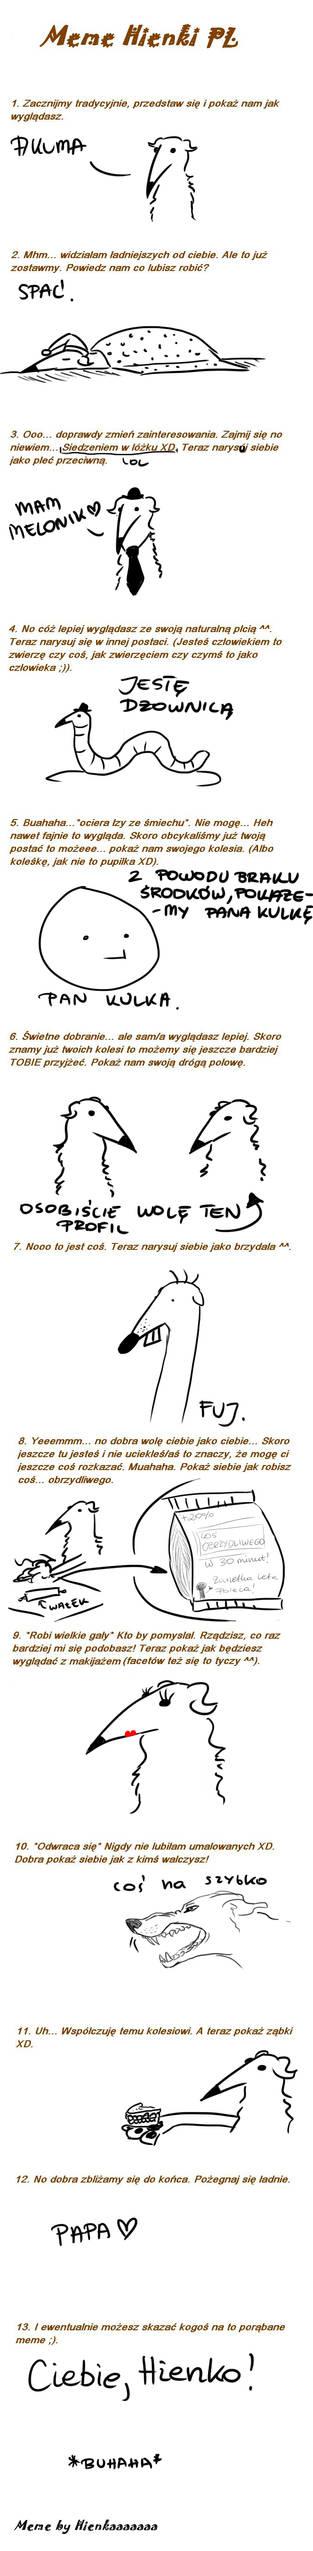 .:Meme PL3:.